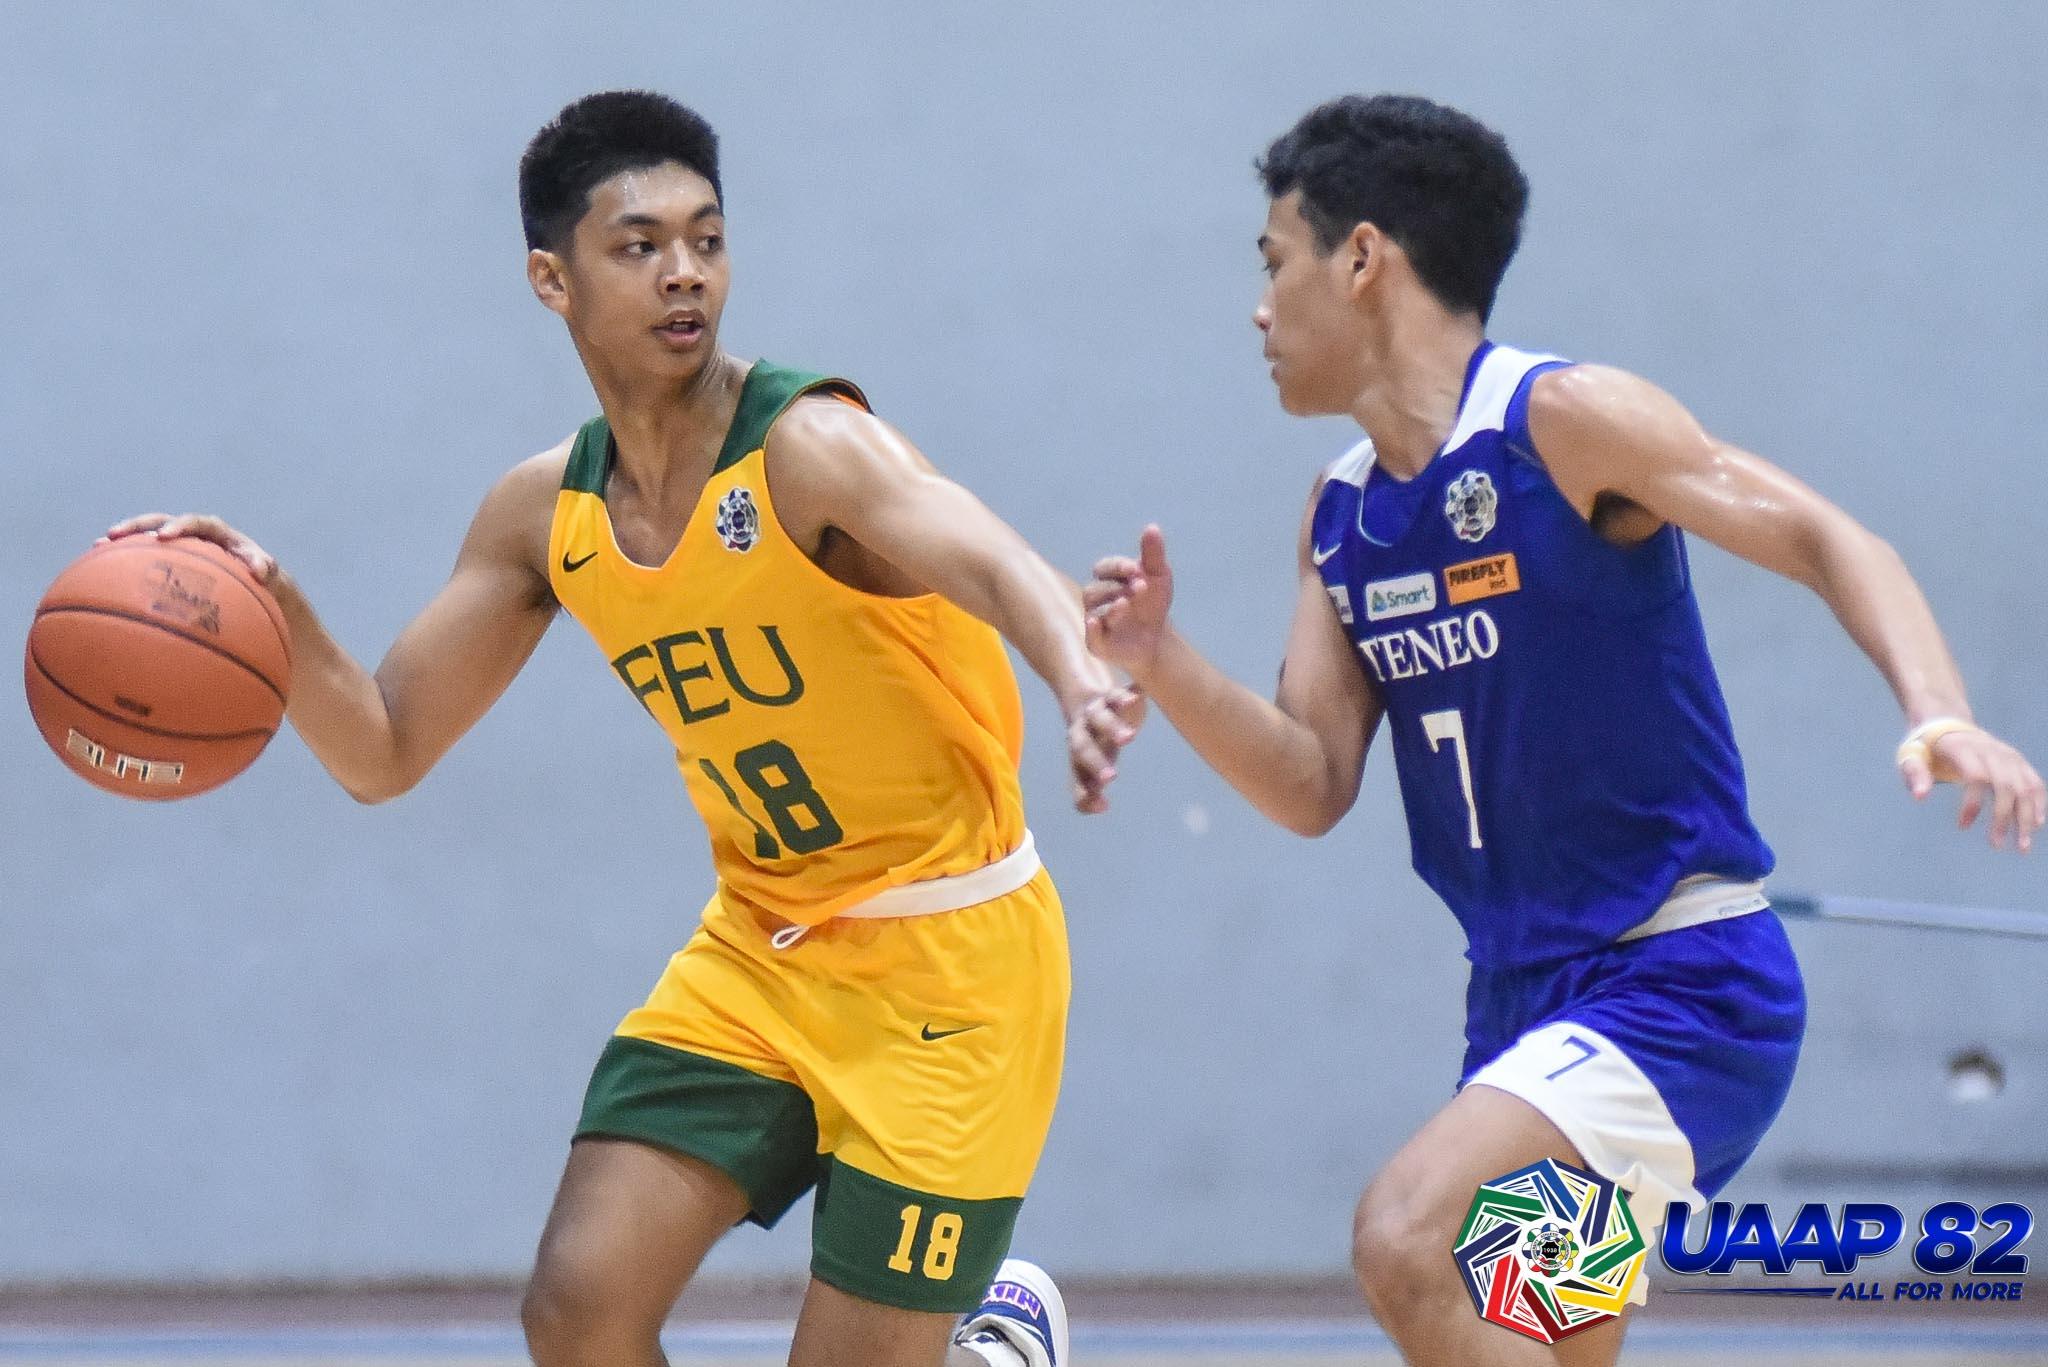 UAAP82-JUNIORS-BASKETBALL-4TH-PHOTO-FEU-JORICK-BAUTISTA NU Bullpups roll to 3-0 as FEU-D deals Ateneo first loss ADMU AdU Basketball DLSU FEU News NU UAAP UE UP UST  - philippine sports news